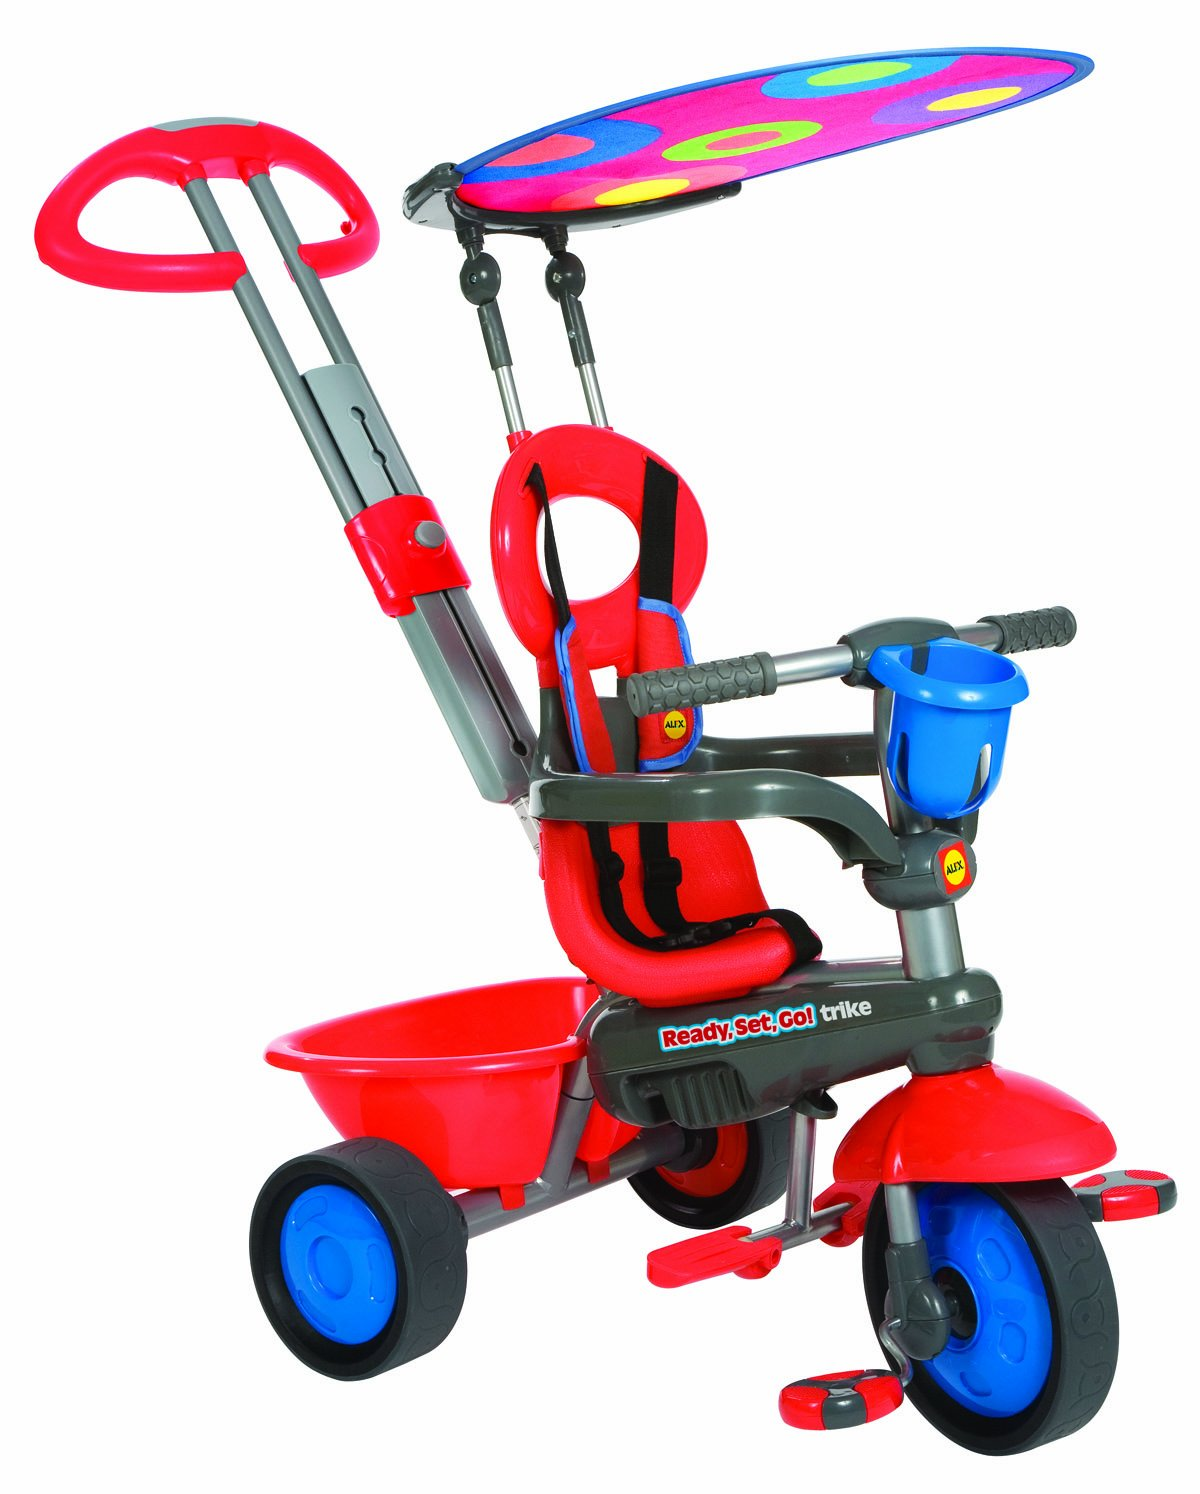 ALEX Toys Ready, Set, Go! Red Trike